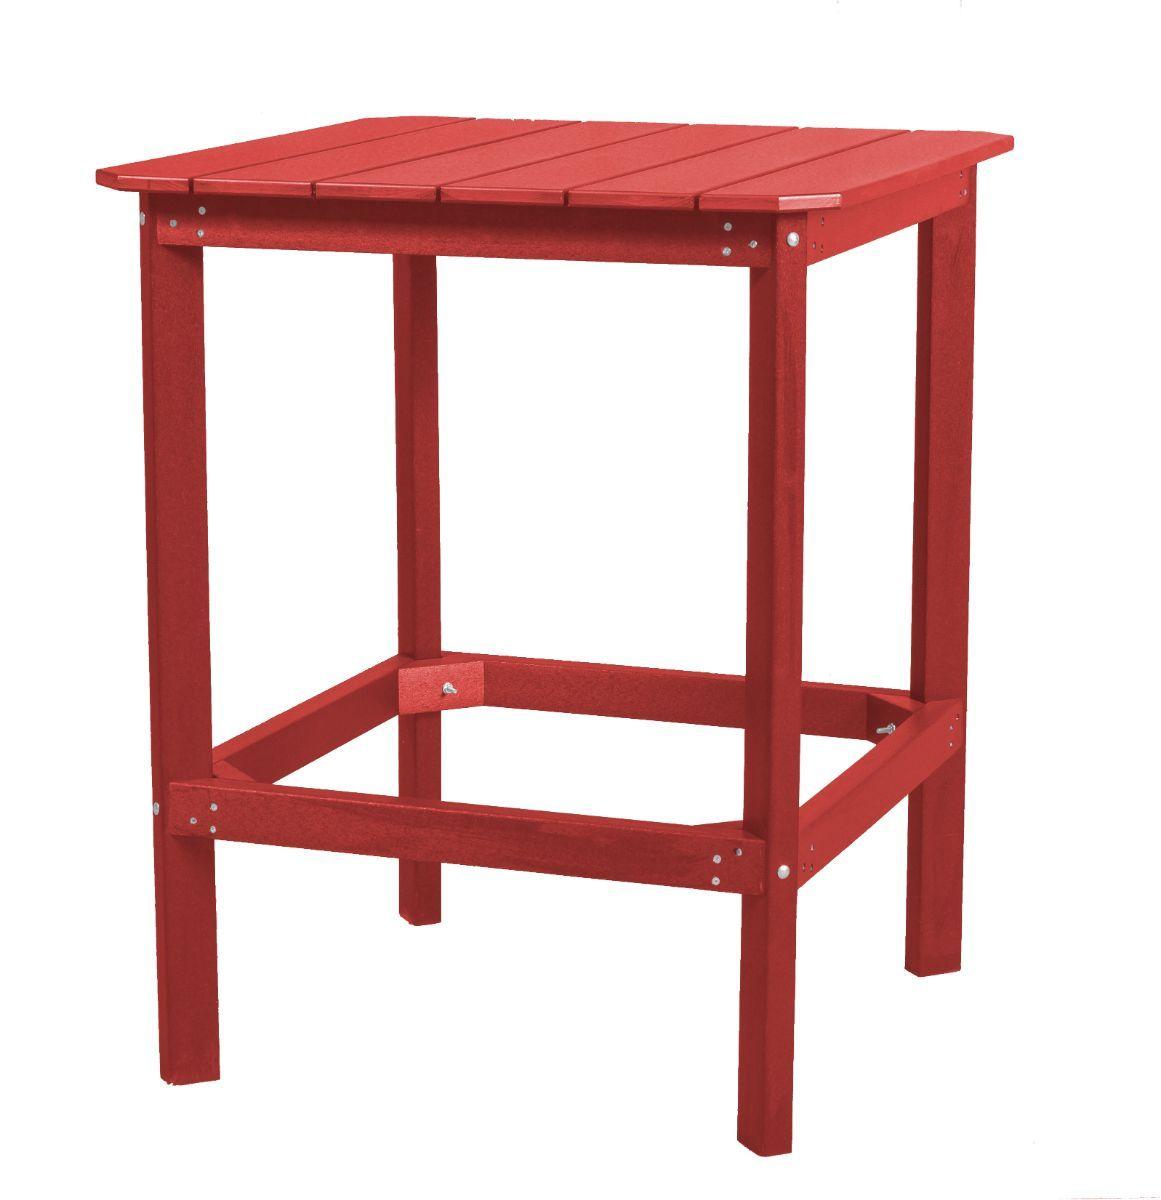 Cardinal Red Panama High Outdoor Dining Table